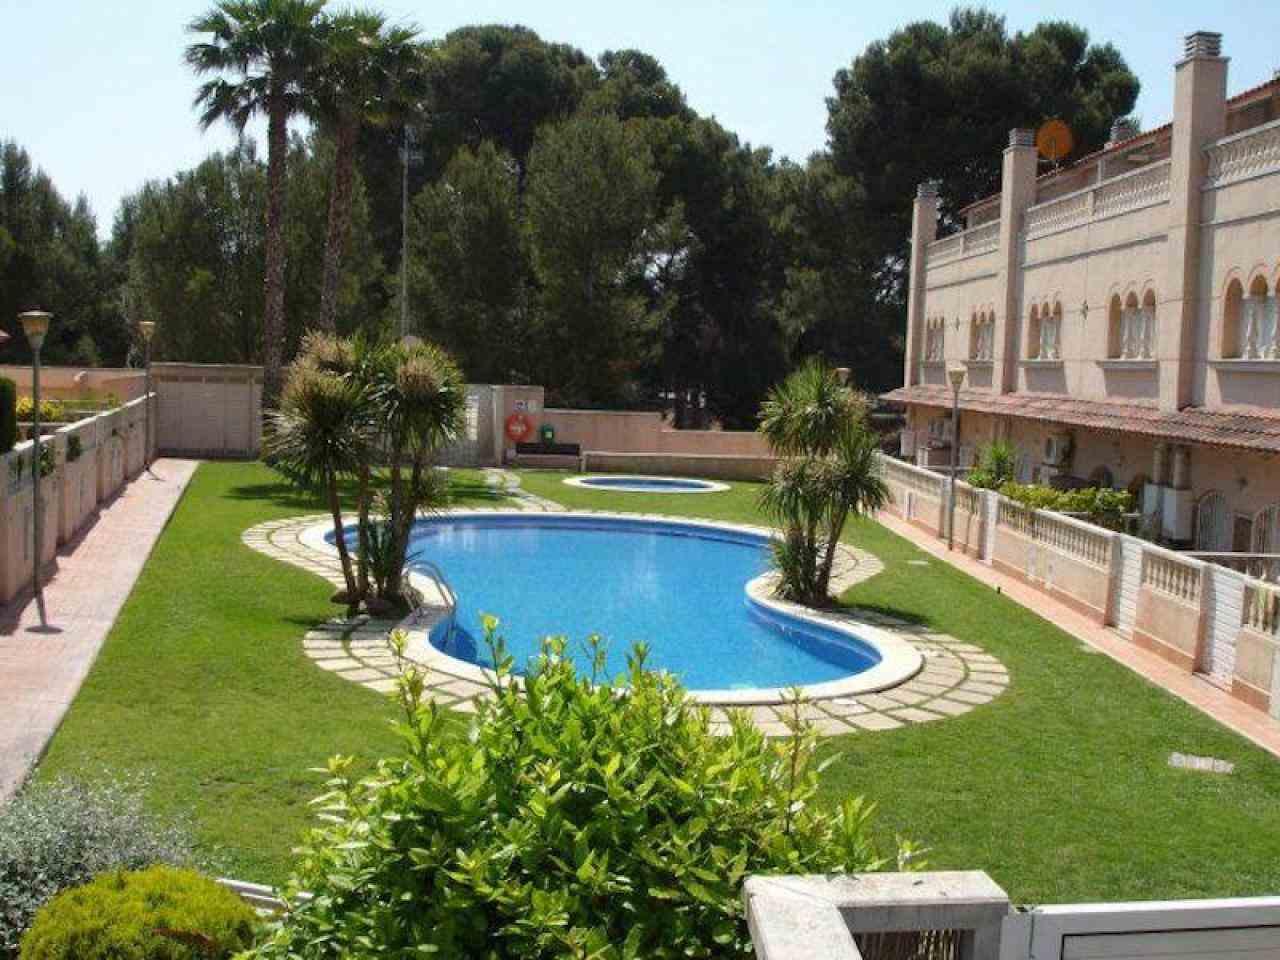 Alquiler vacaciones en Francàs, Tarragona